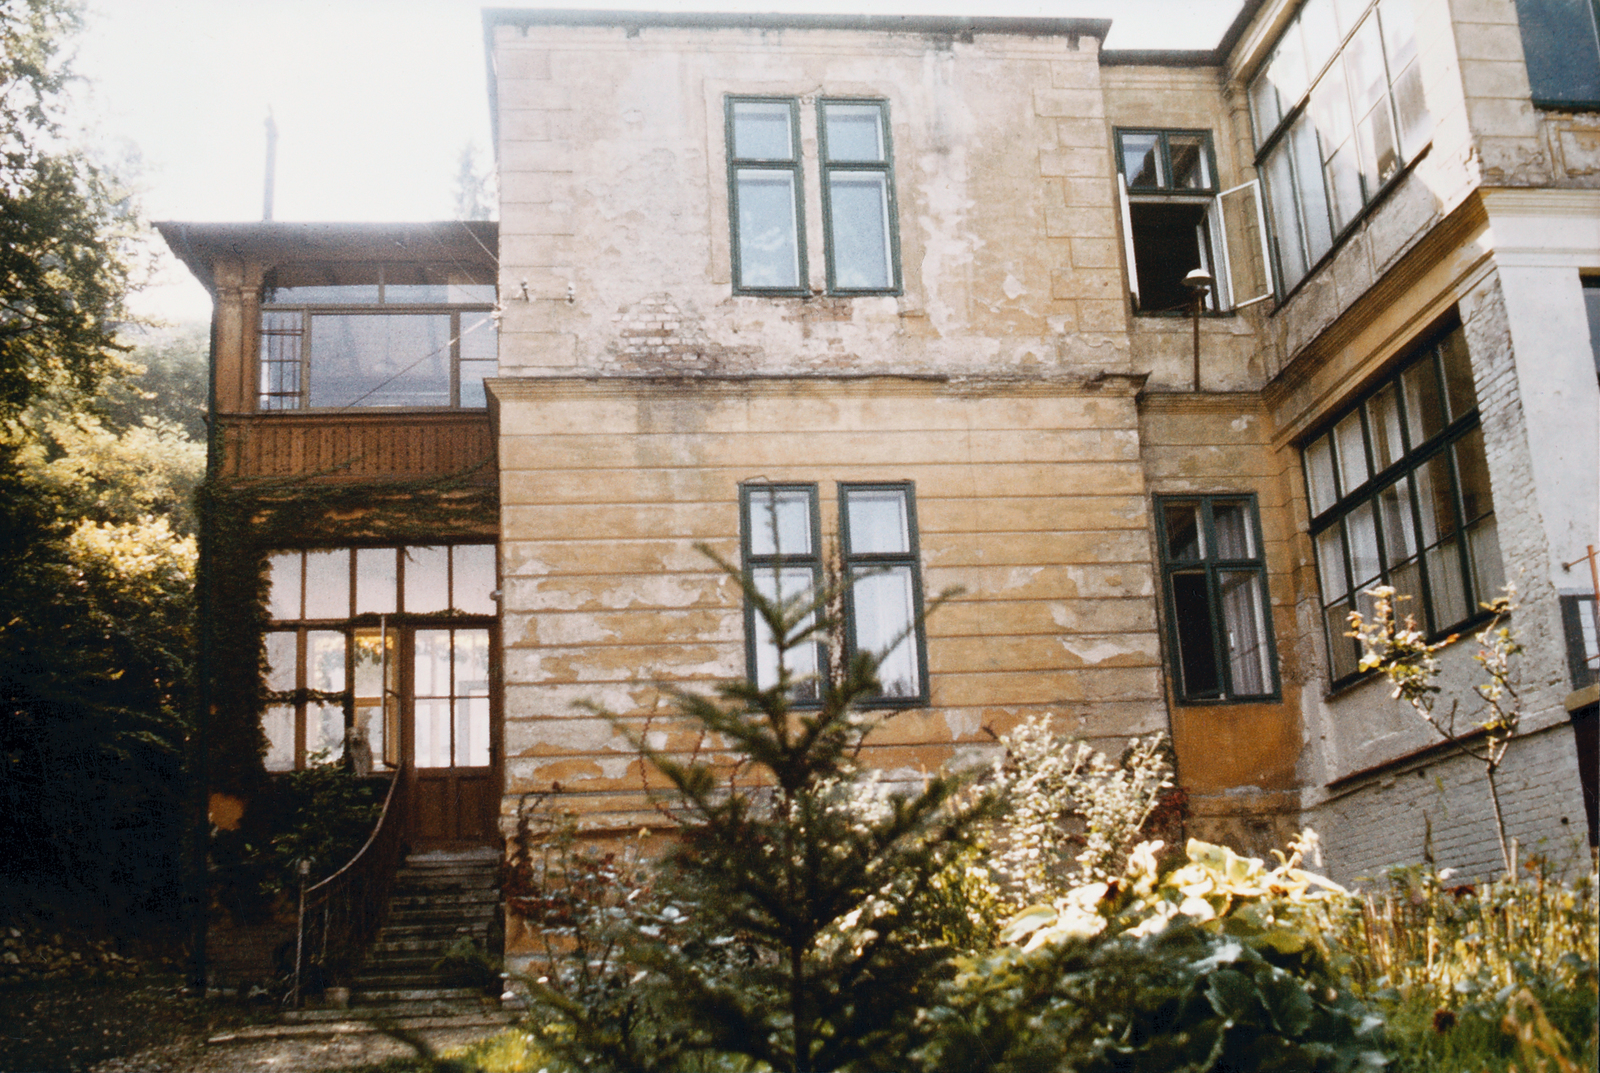 Budapest - Multi-Unit Residential Building - 1976